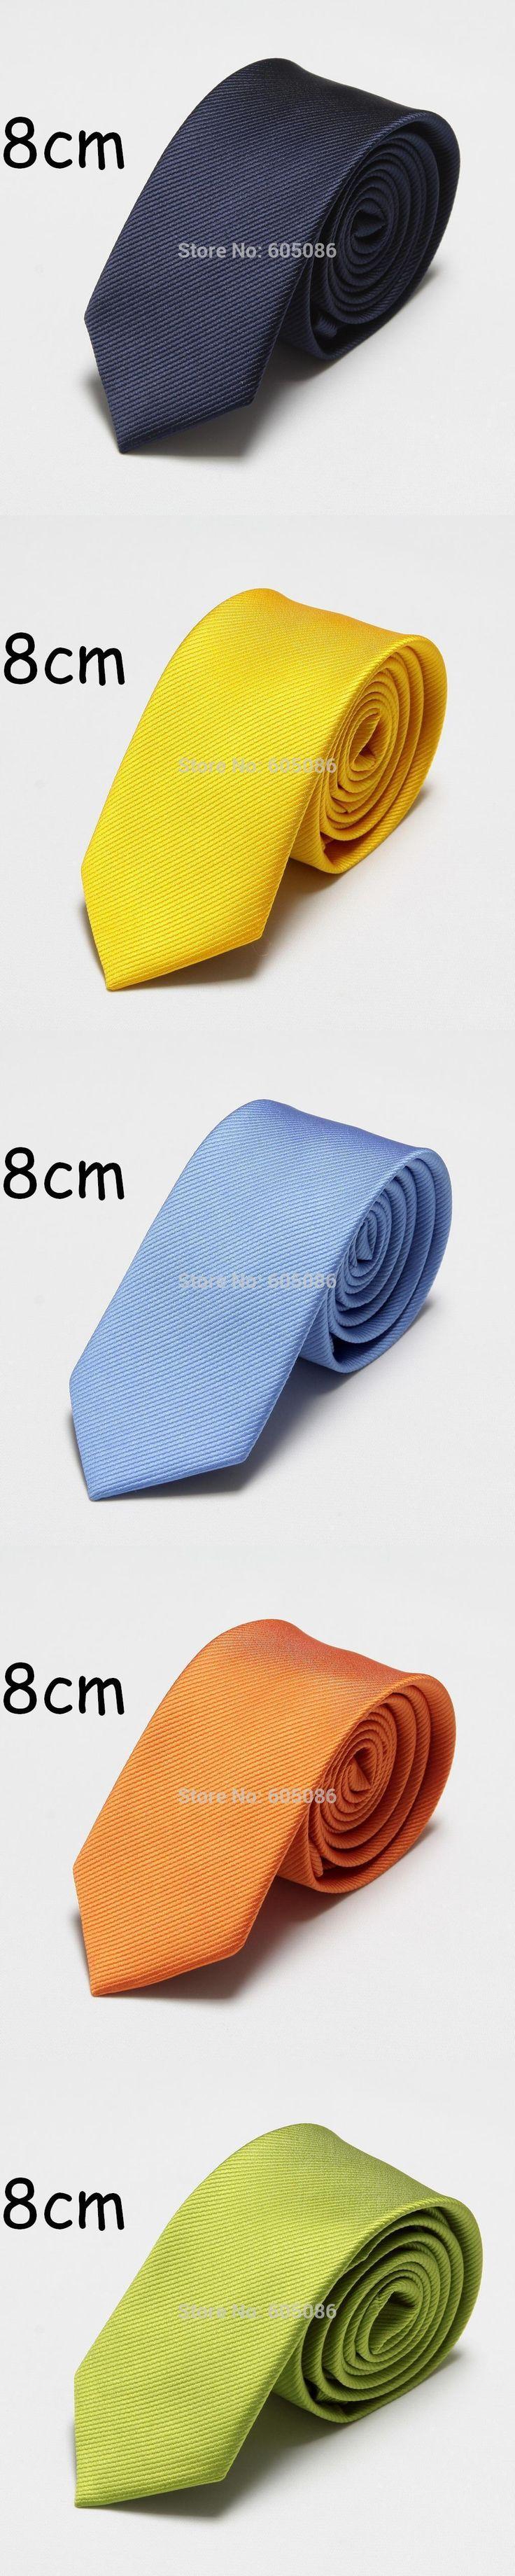 HOOYI 2017 solid polyester fashion men's tie dress neck ties for men cravat 8cm width